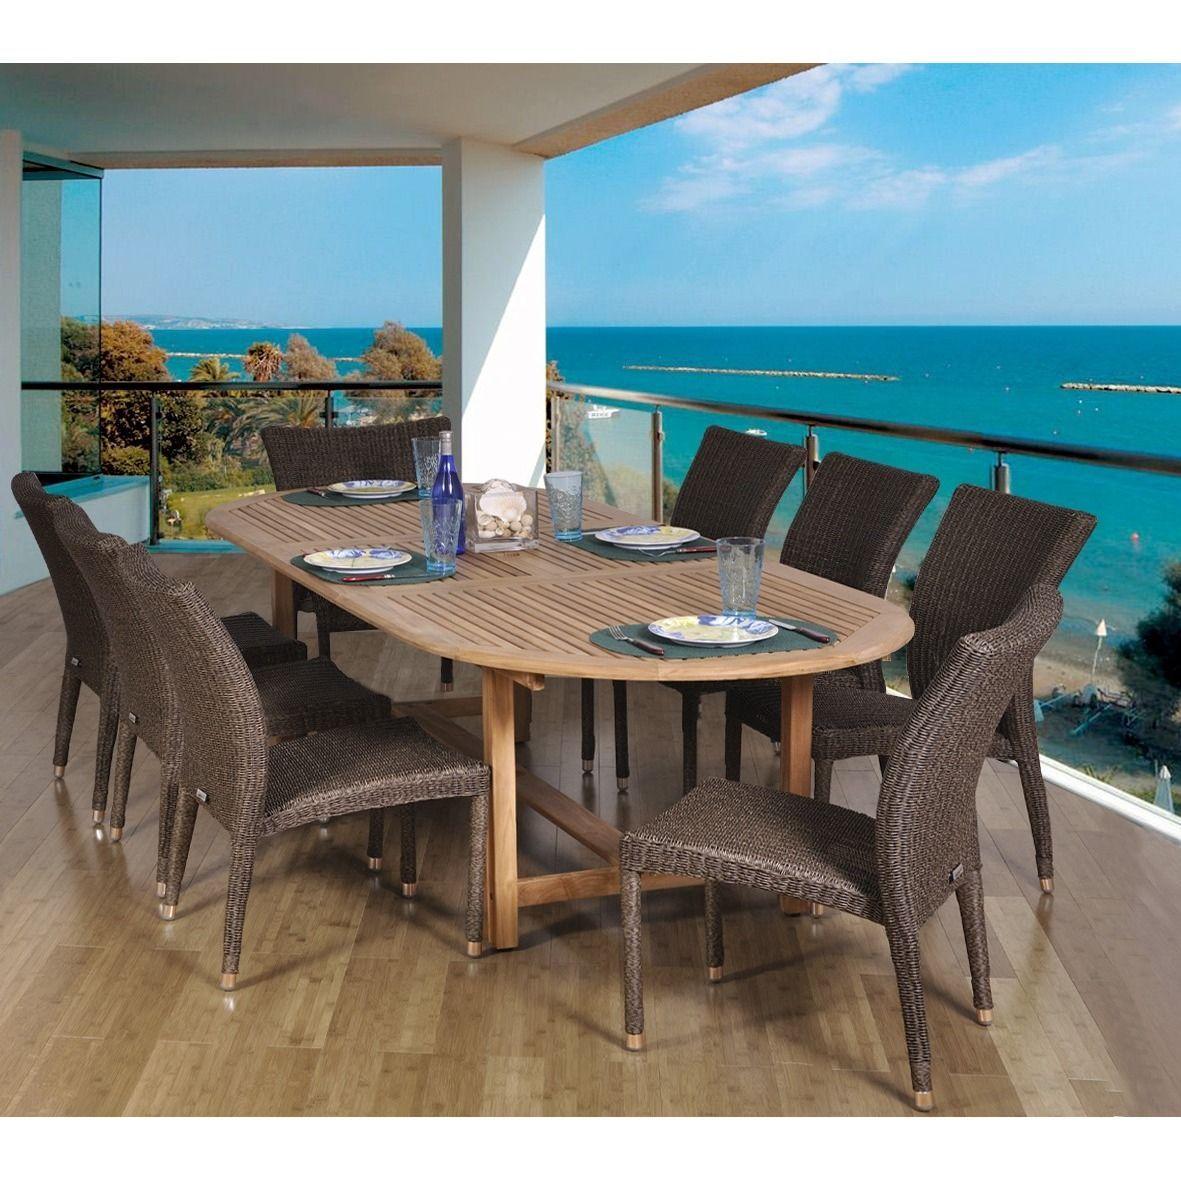 44+ Tahiti 7 piece oval outdoor dining setting Inspiration